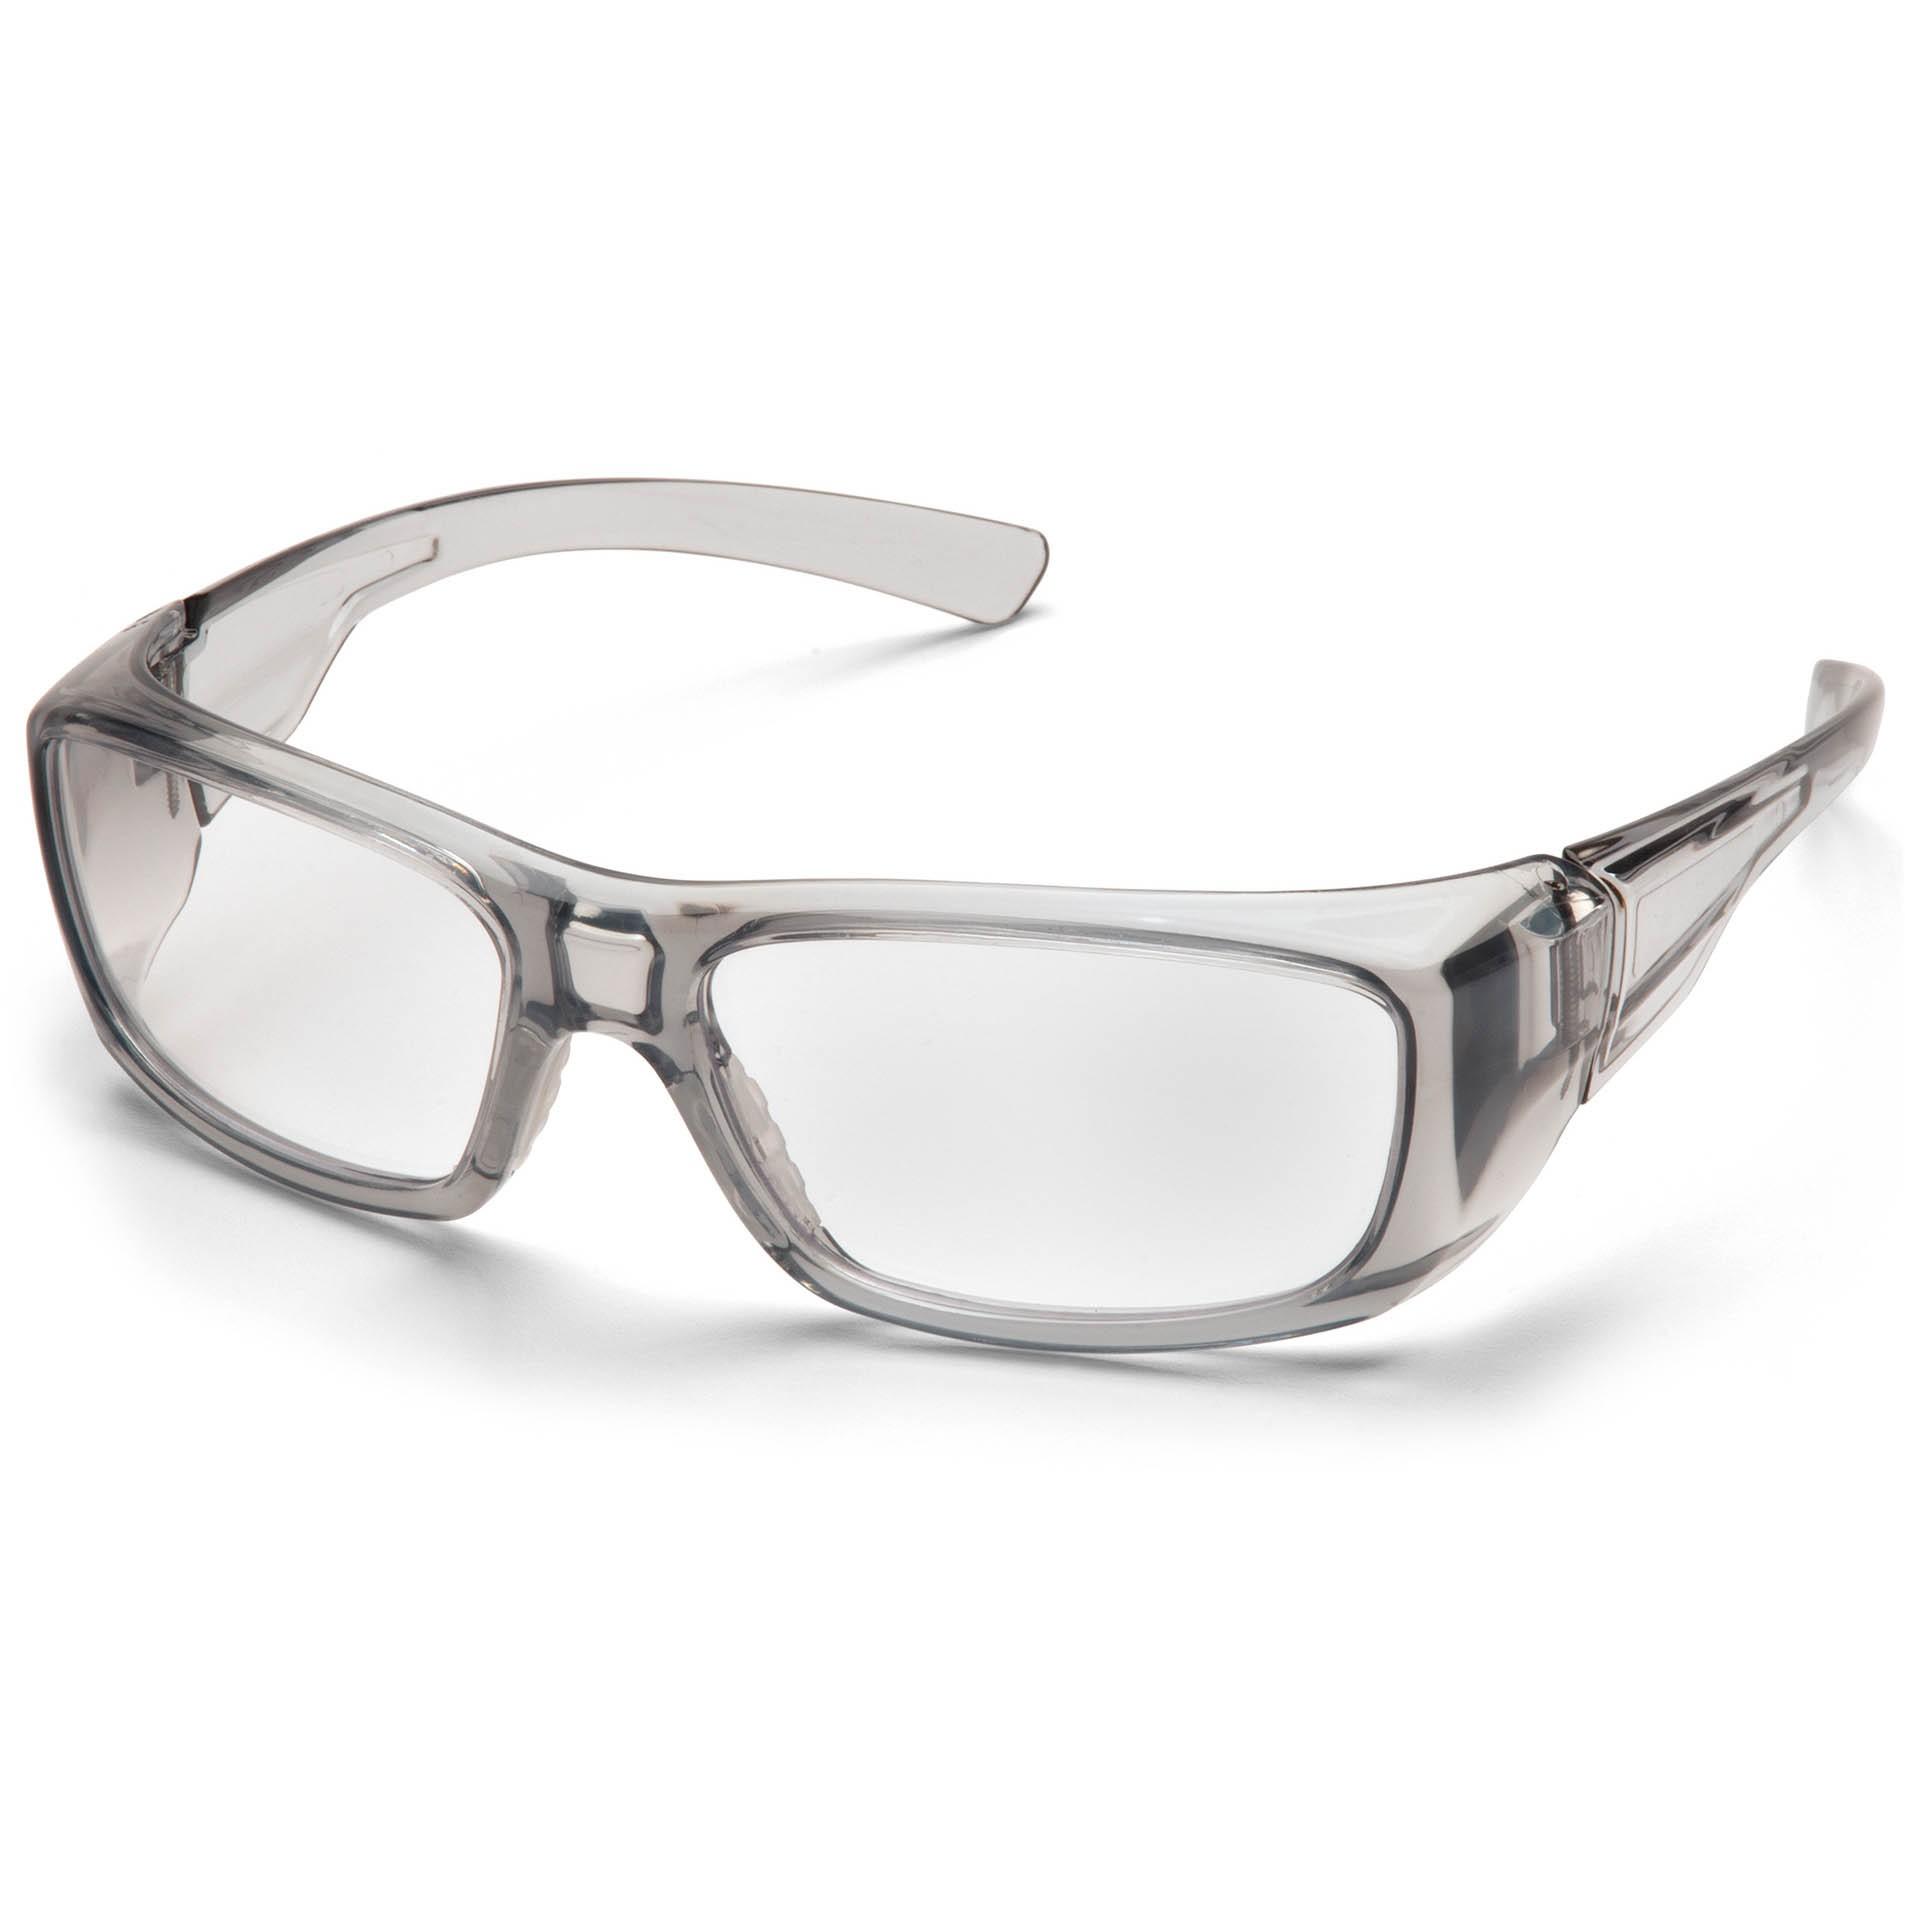 Glasses Gray Frame : Pyramex Emerge Safety Glasses - Gray Frame - Clear Full ...